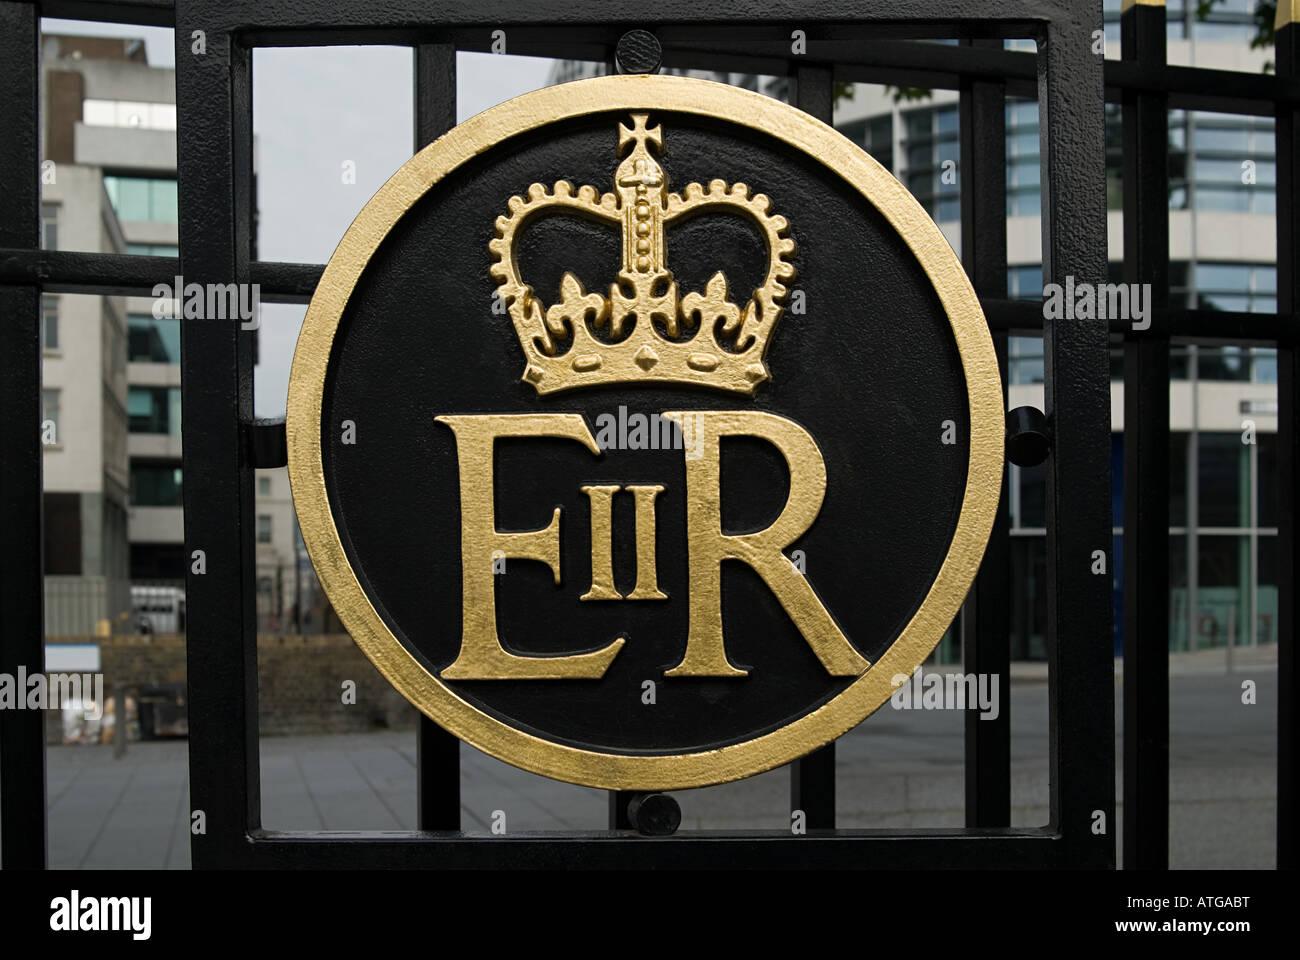 Queen elizabeth ii symbol on gate - Stock Image